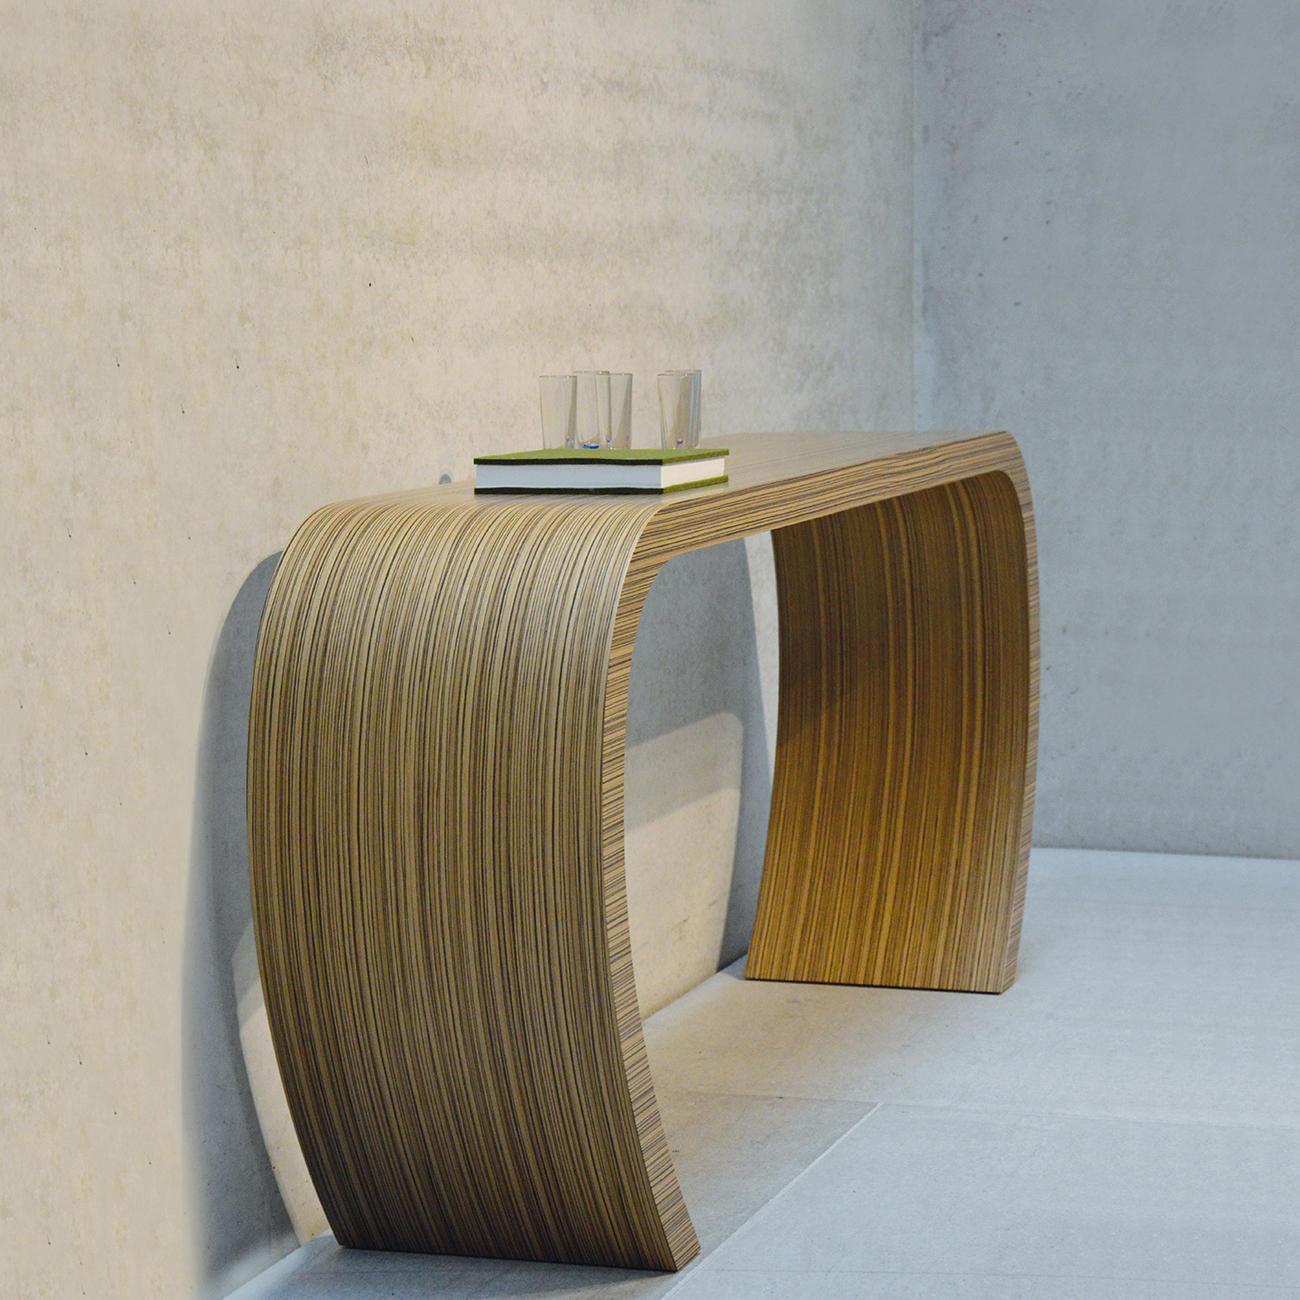 sidebow 3 jahre garantie pro idee. Black Bedroom Furniture Sets. Home Design Ideas